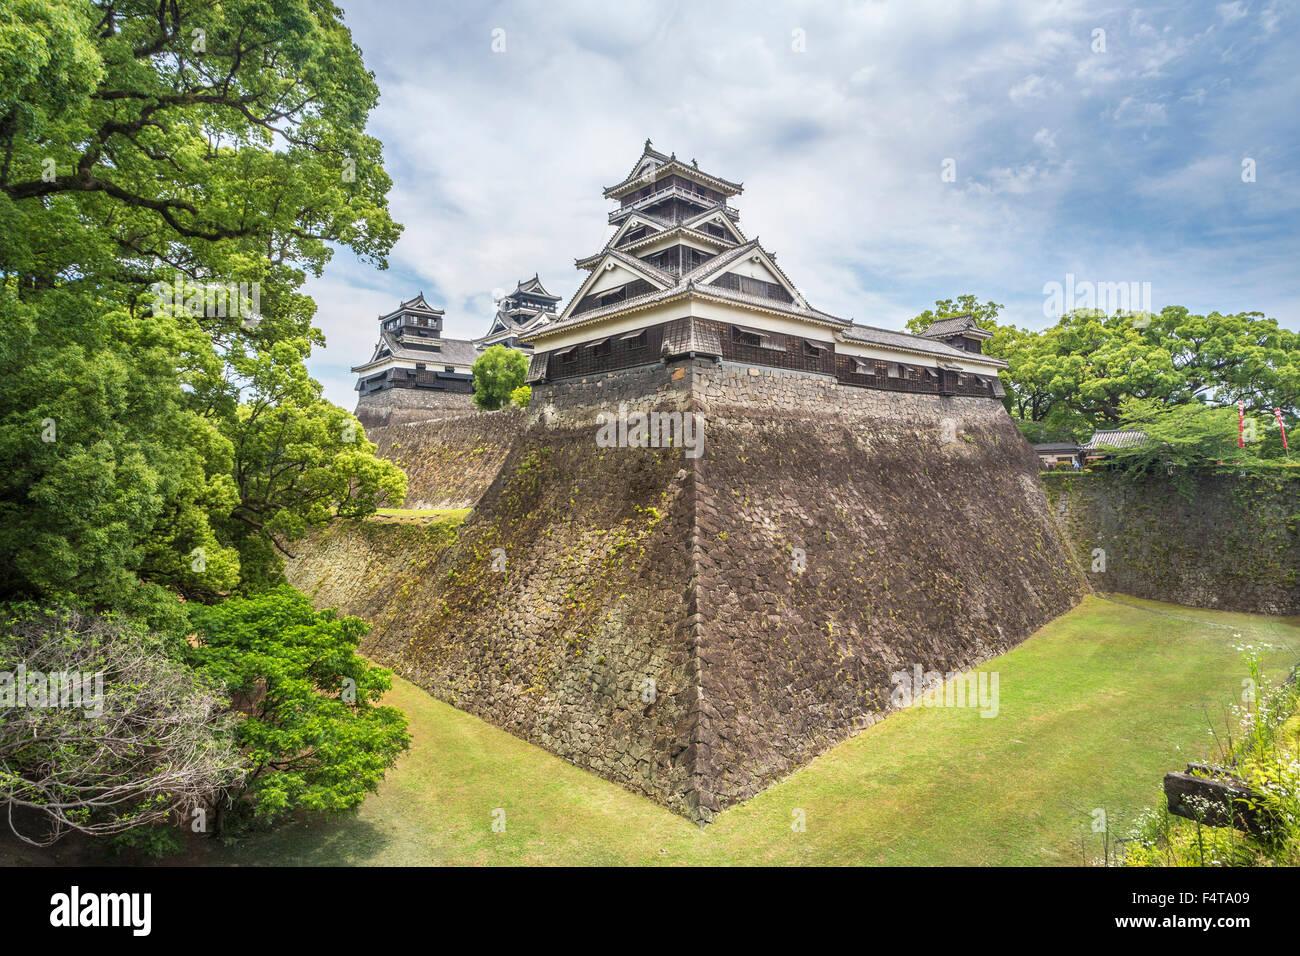 Japan, Kyushu Island, Kumamoto City, Kumamoto Castle - Stock Image